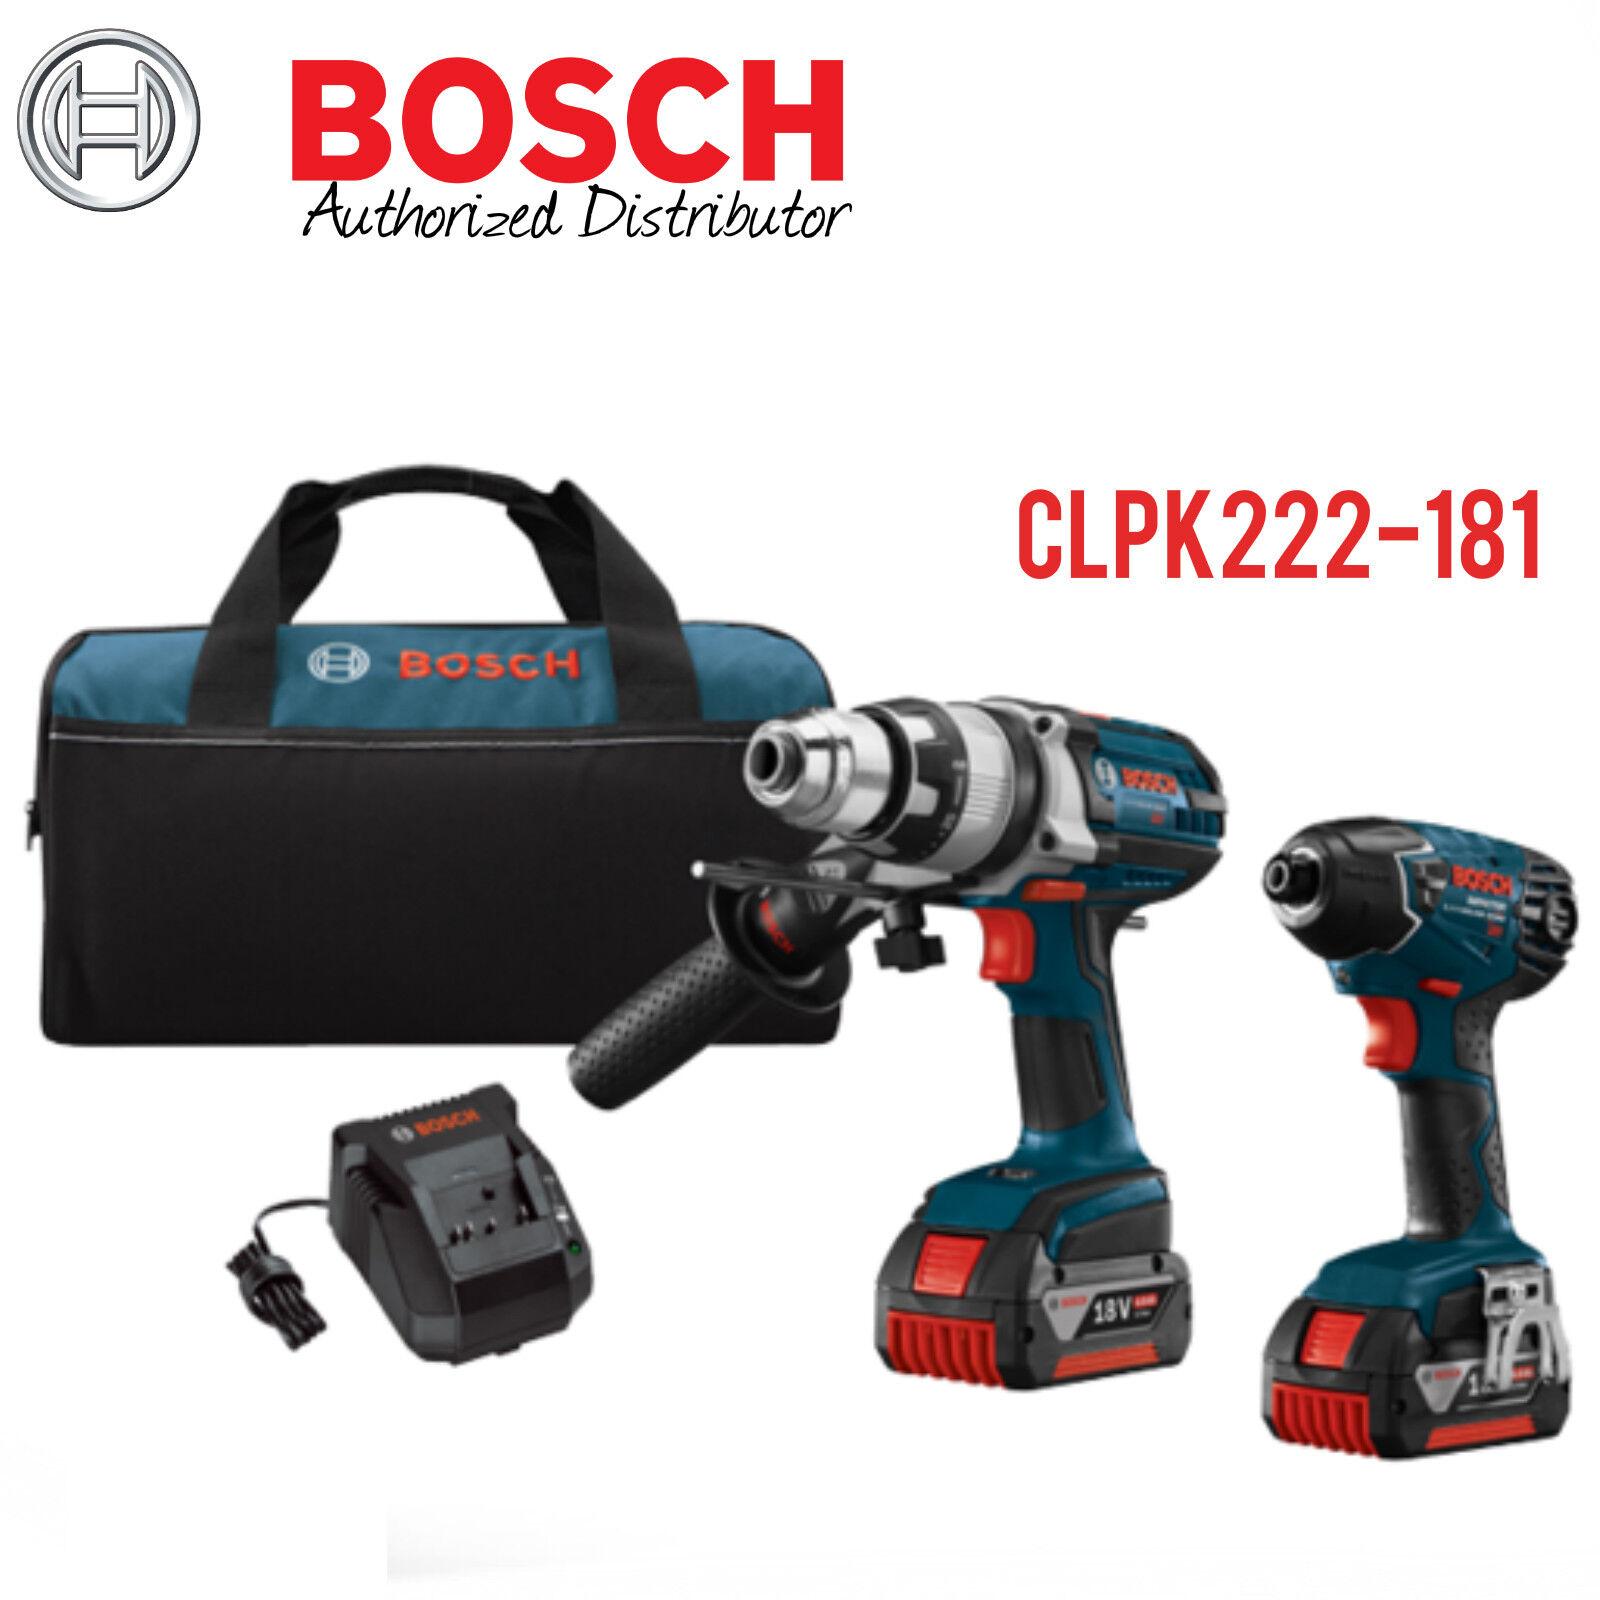 Bosch CLPK222-181 18V 4.0 Ah Cordless Lithium-Ion Brute Toug